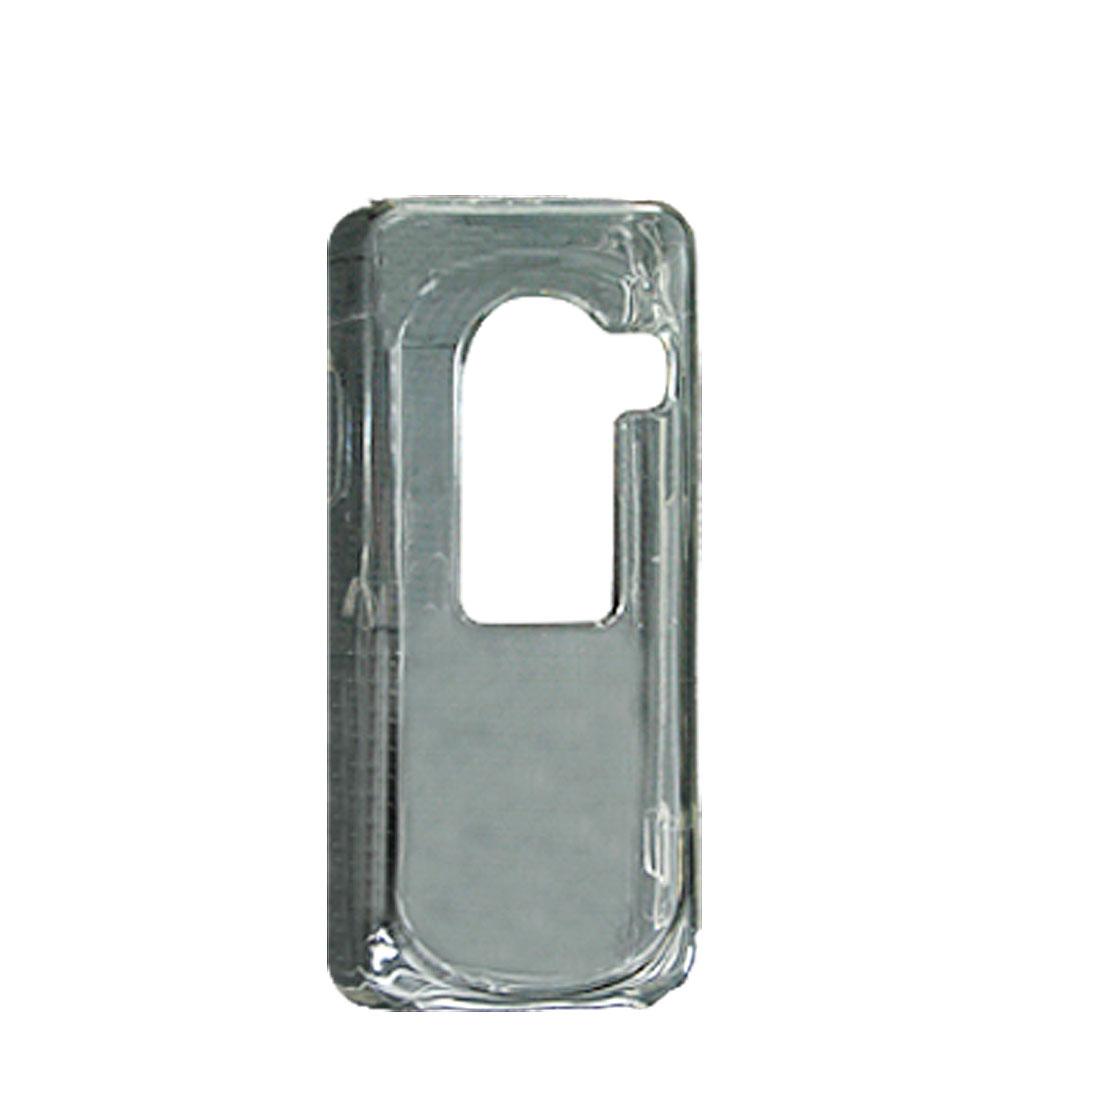 Transparent Plastic Crystal Case for Nokia N73